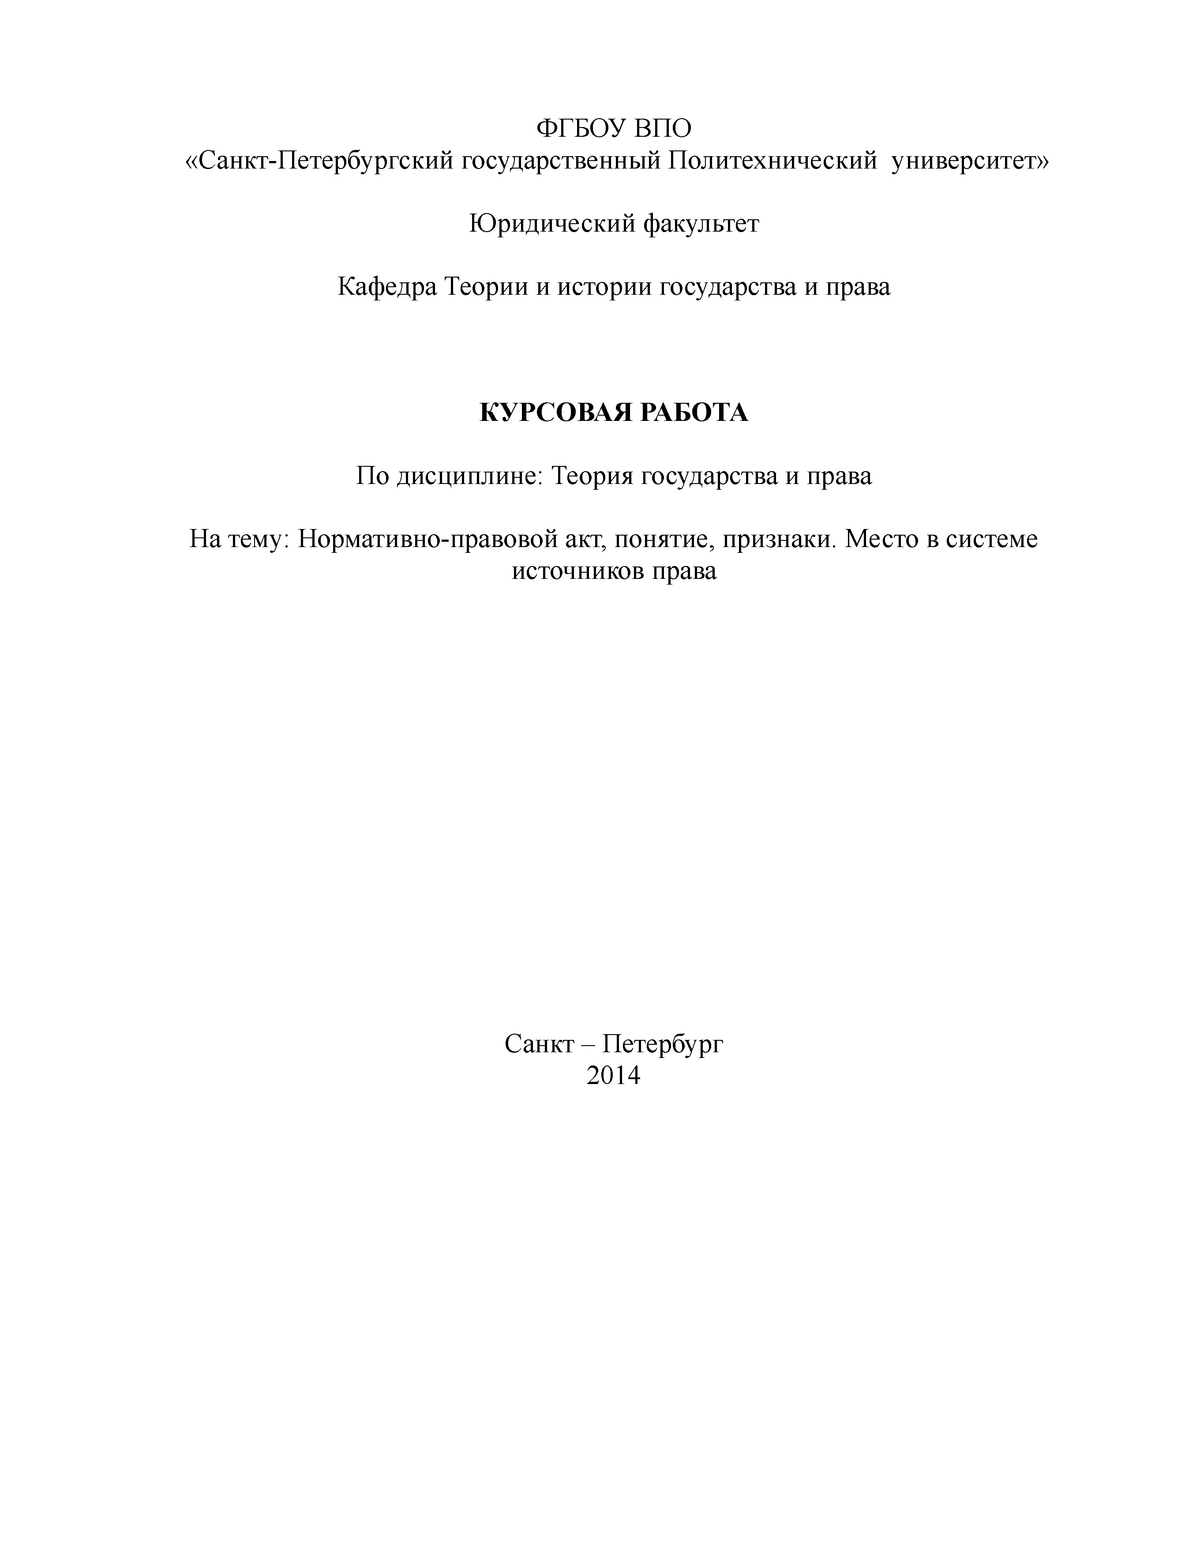 Курсовая работа на тему нормативные акты 7005